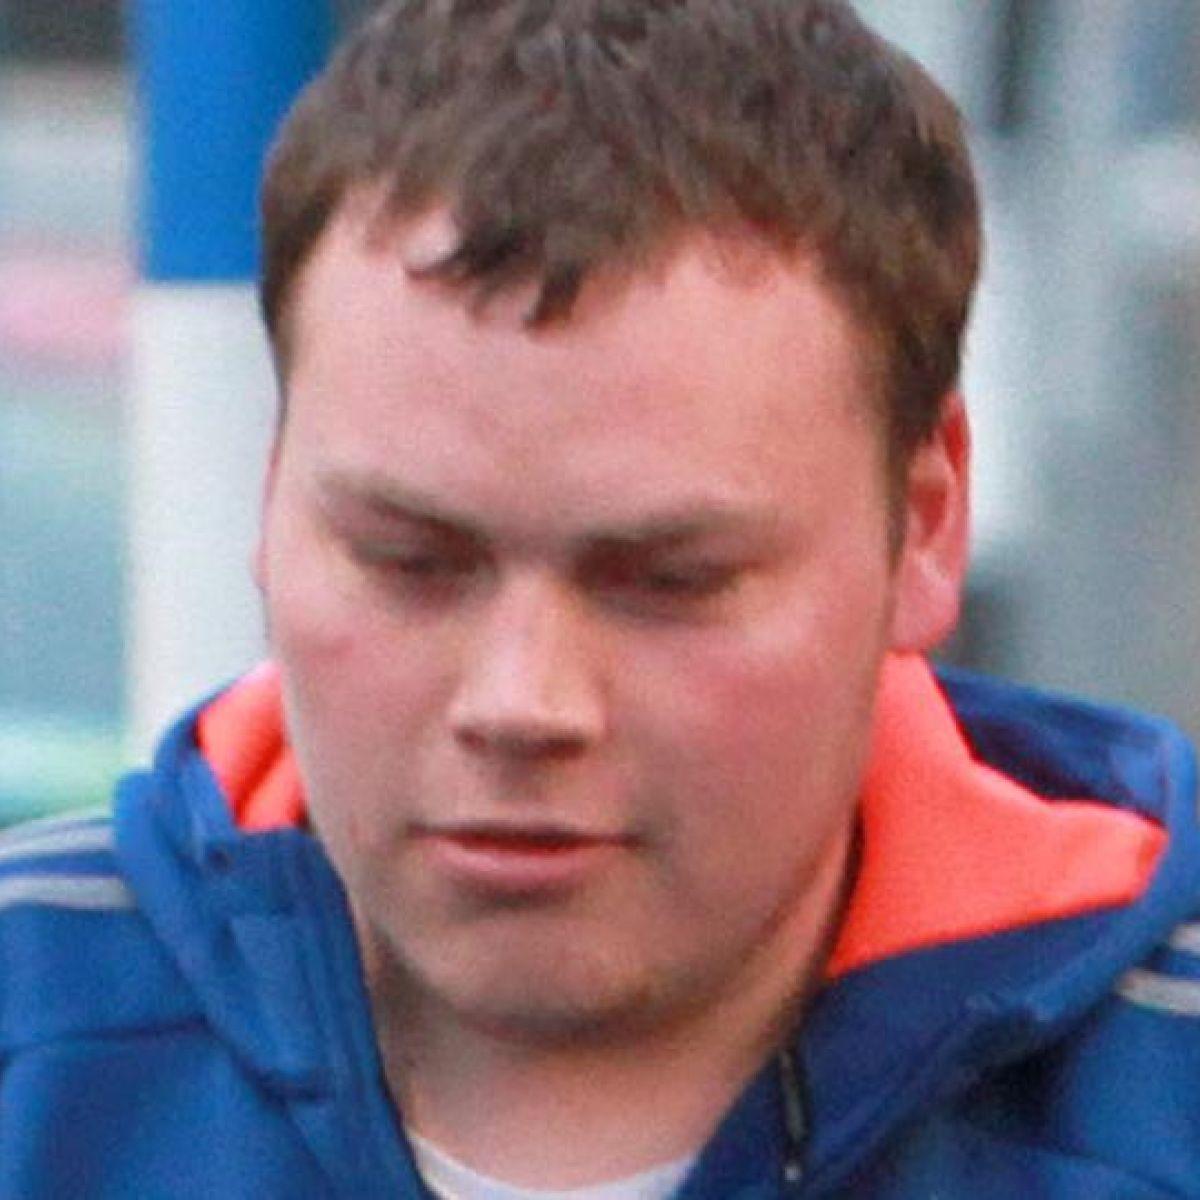 County Kildare Single Men Dating Site, Date Single Guys in